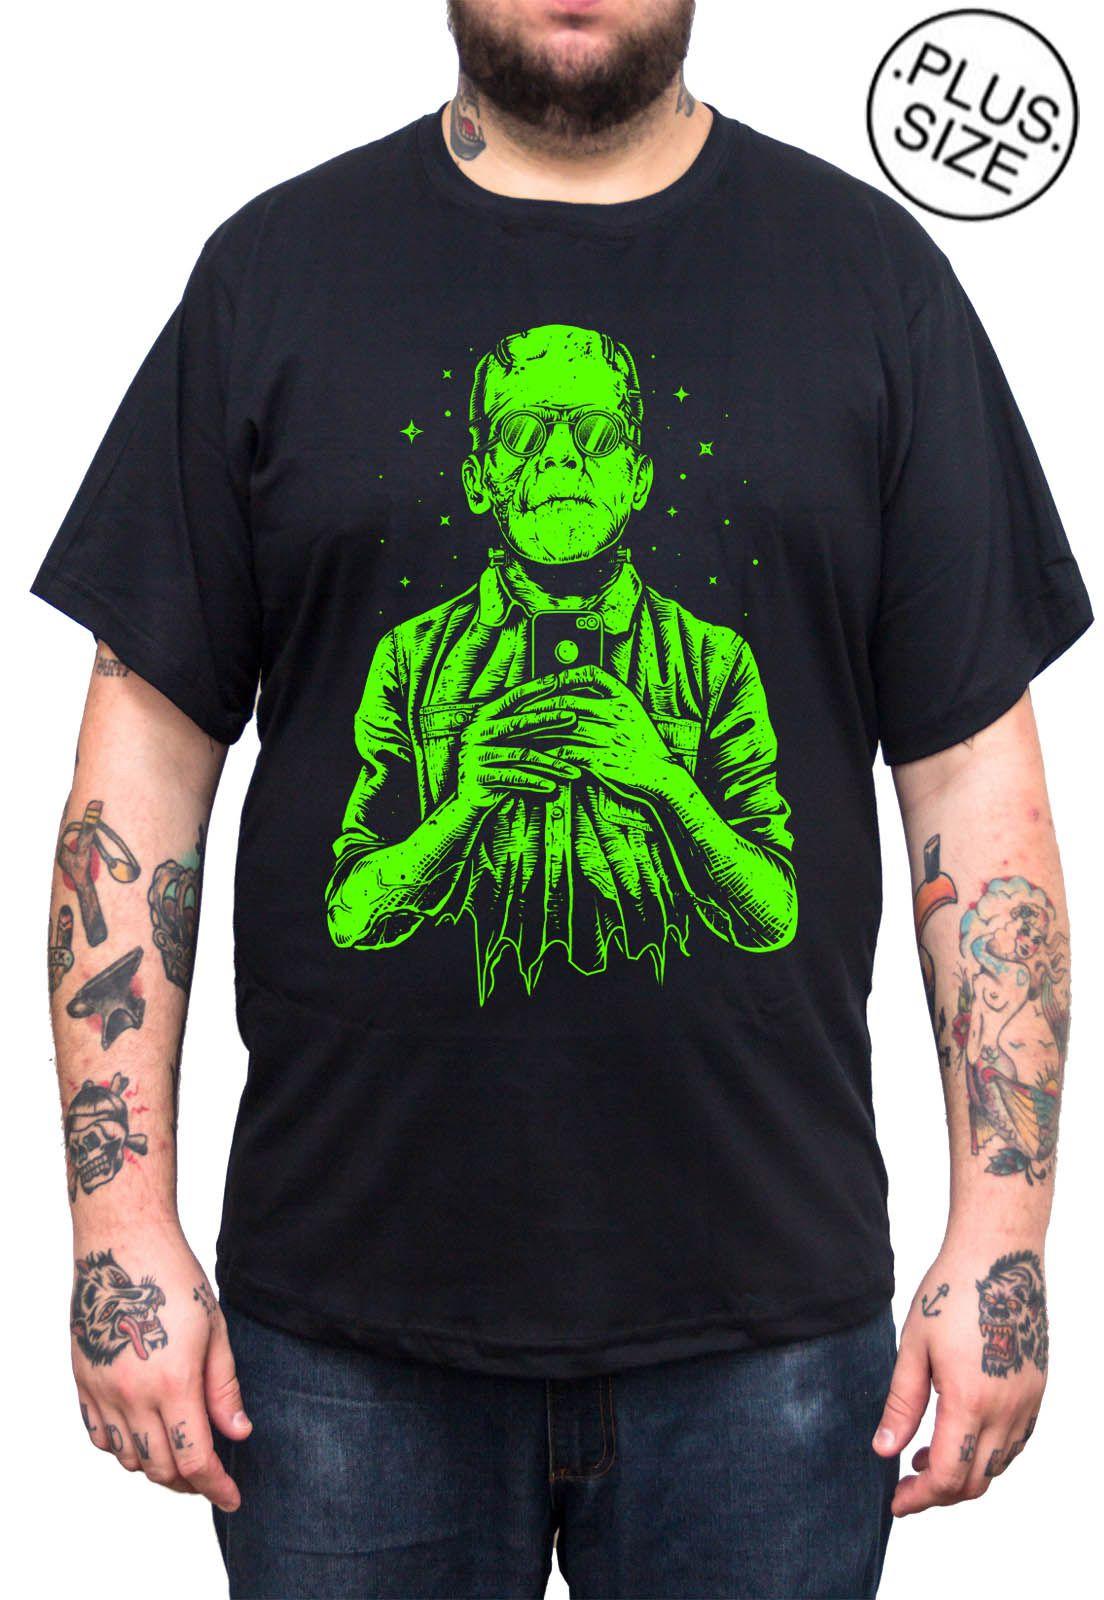 Camiseta Hshop Frankselfie - Preto - Plus Size - Tamanho Grande XG  - HShop